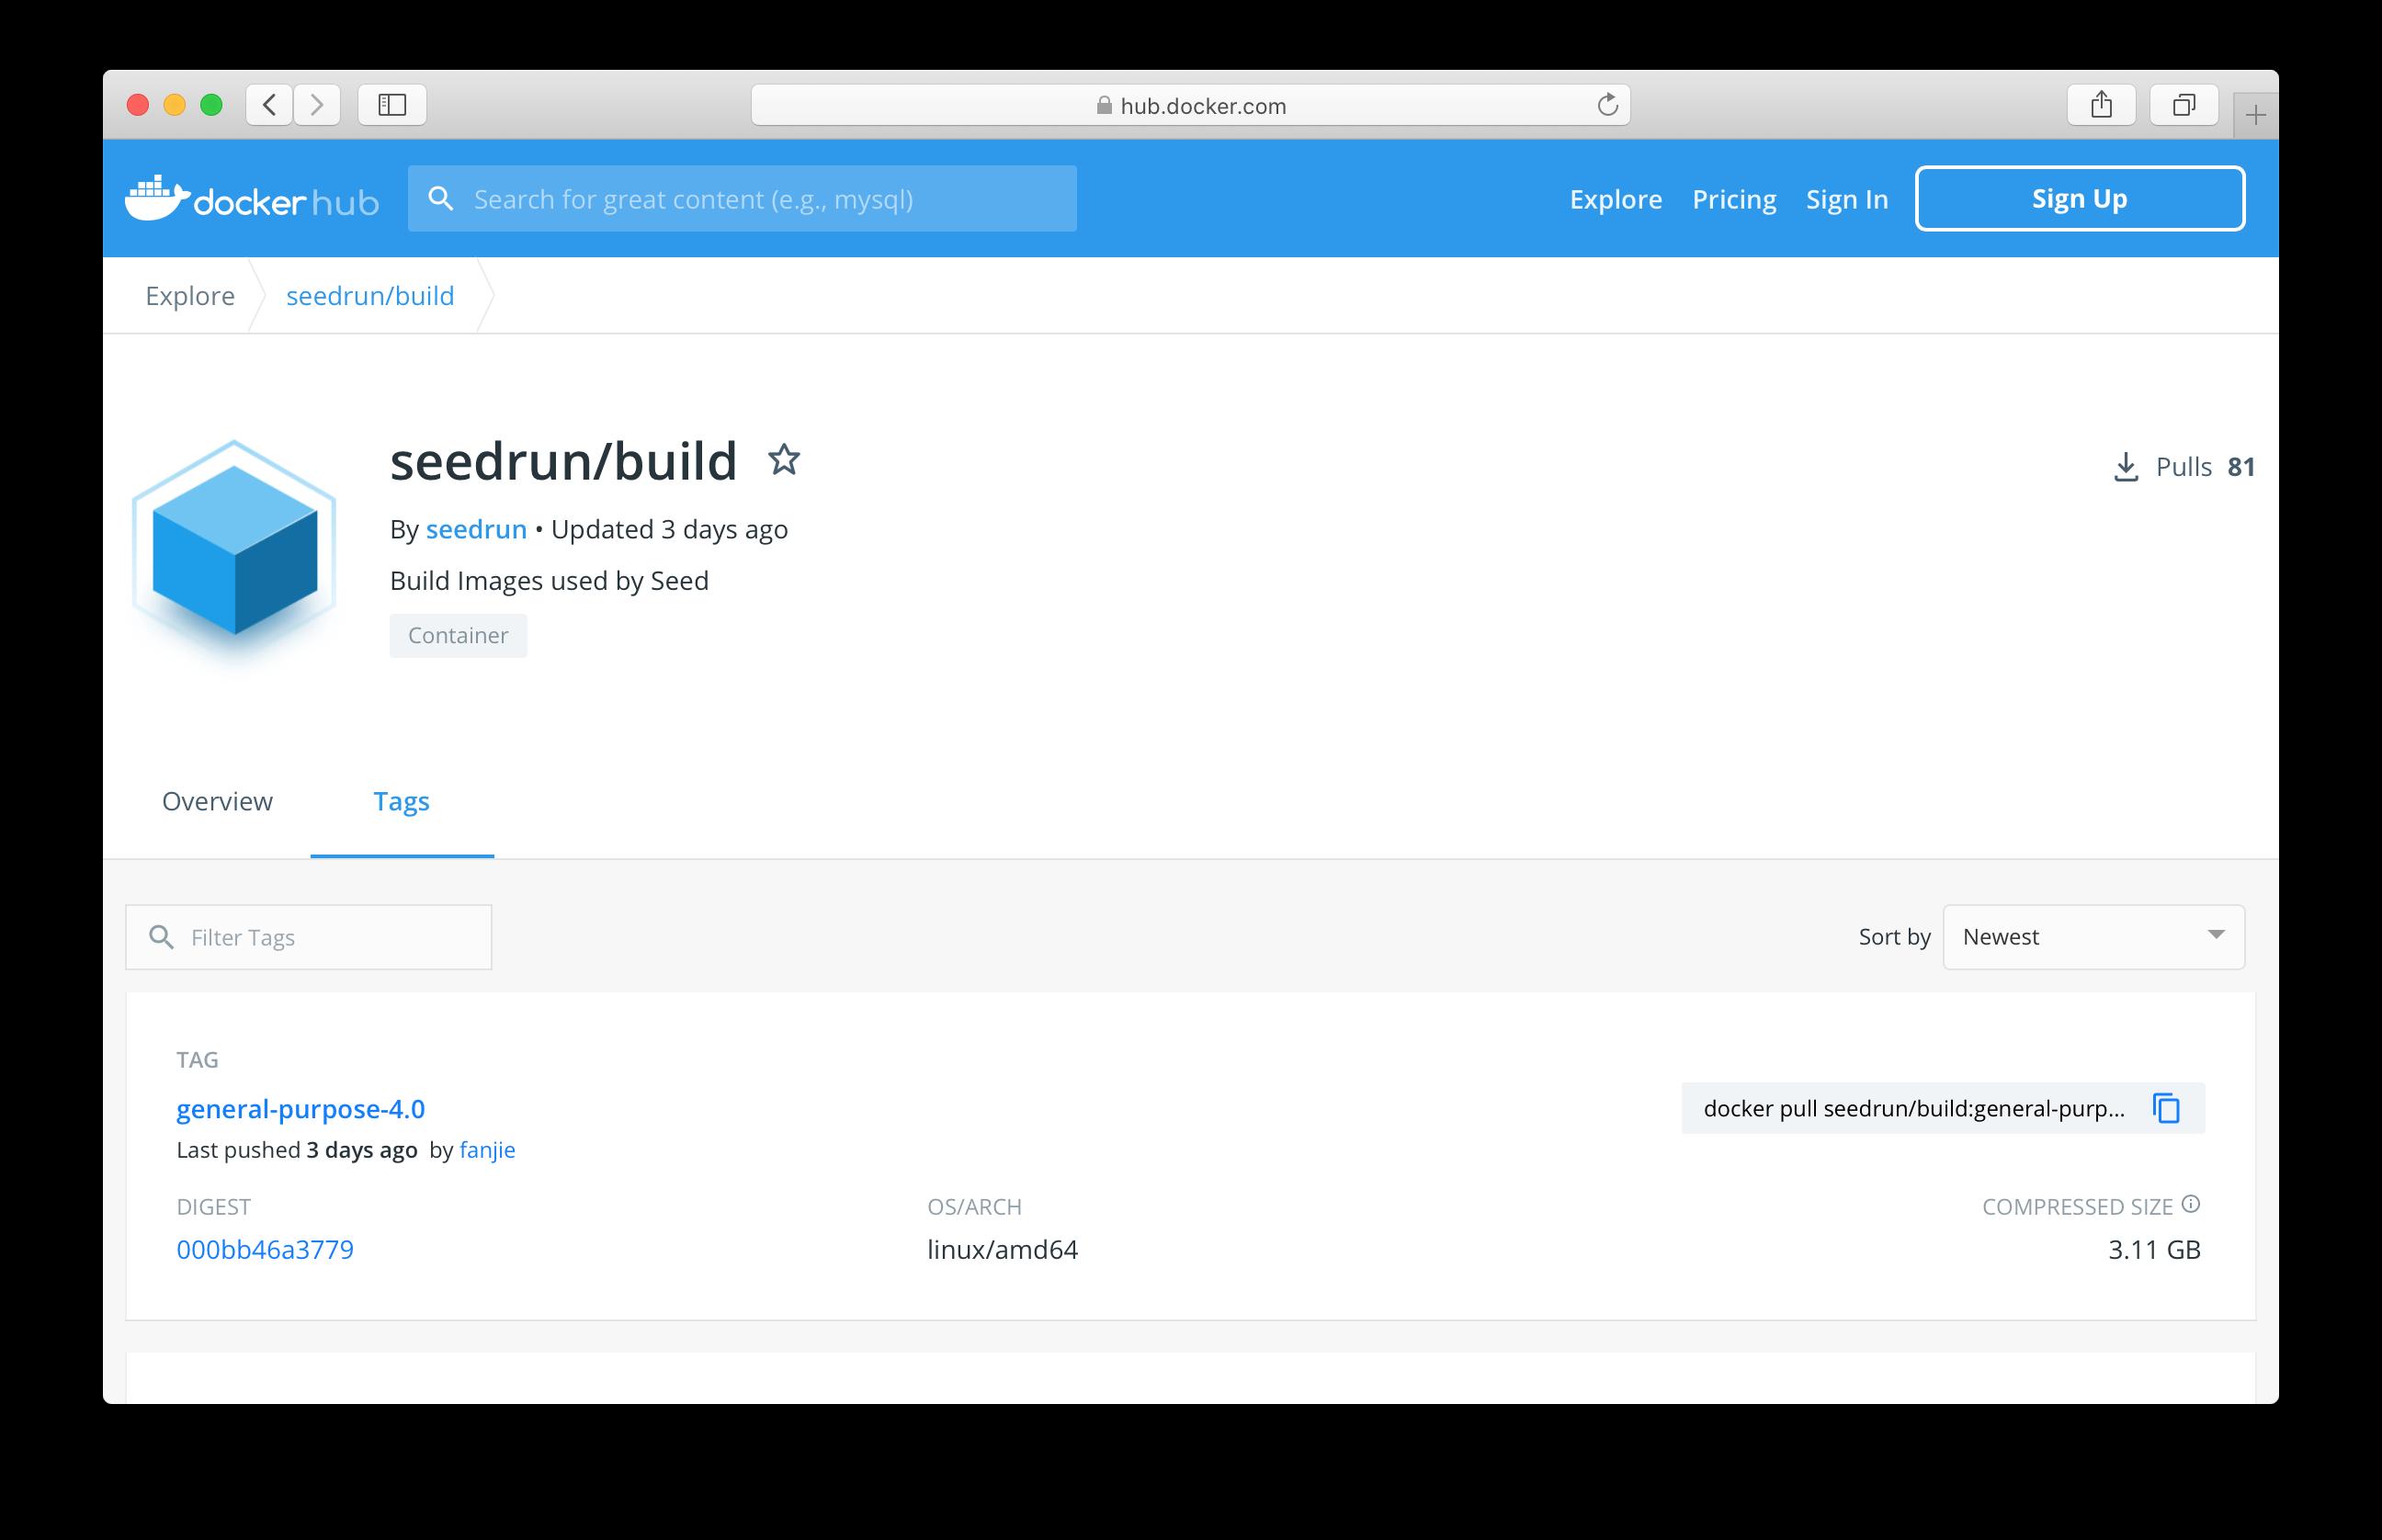 Seed build images in Docker Hub